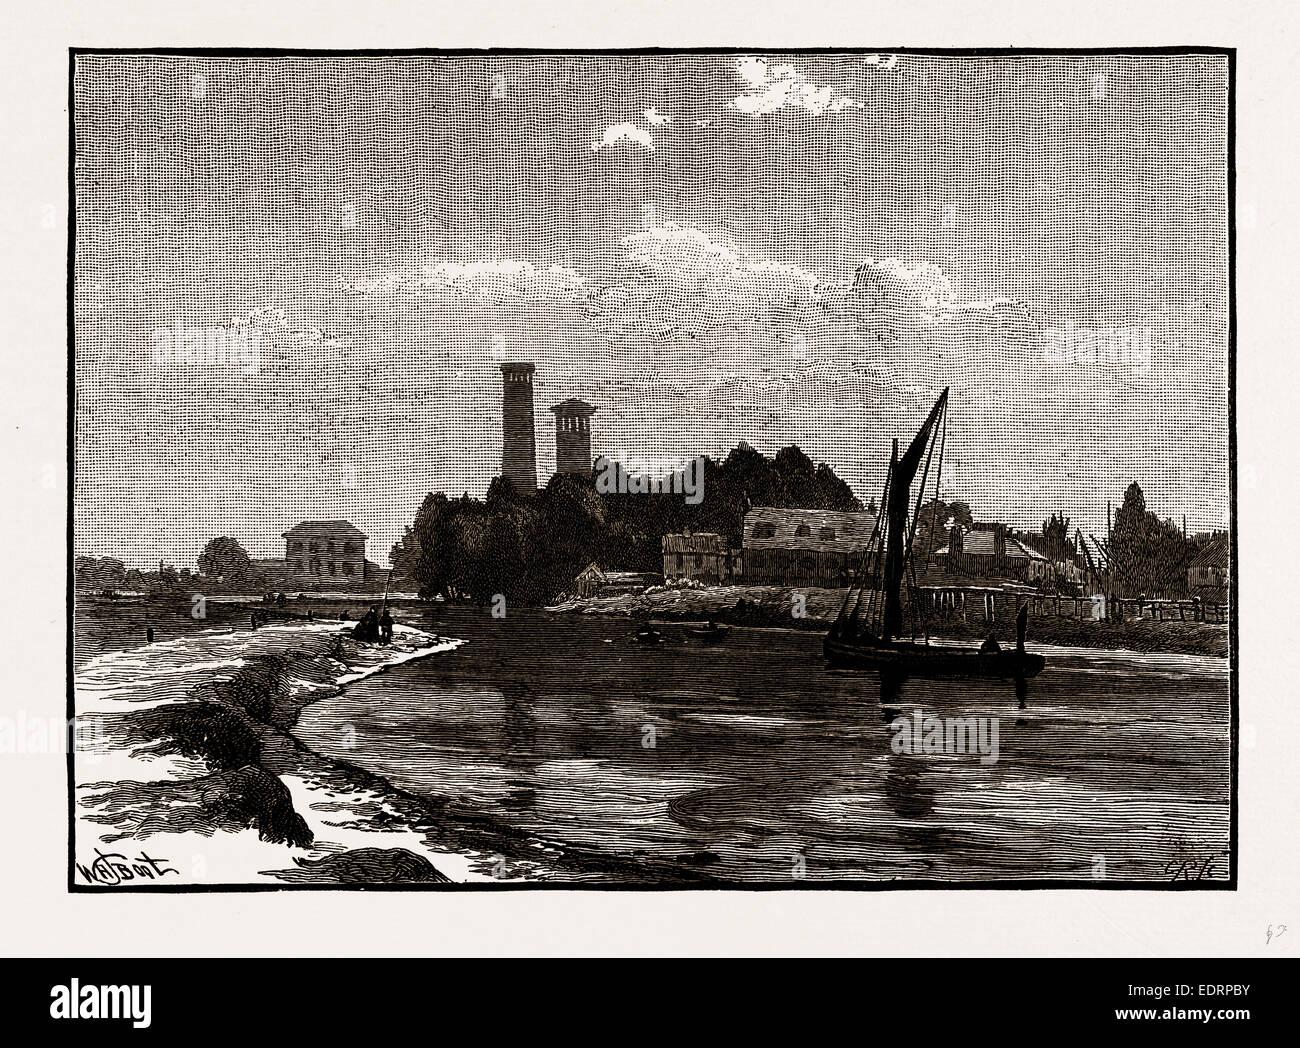 AT LEA BRIDGE, UK, engraving 1881 - 1884 - Stock Image